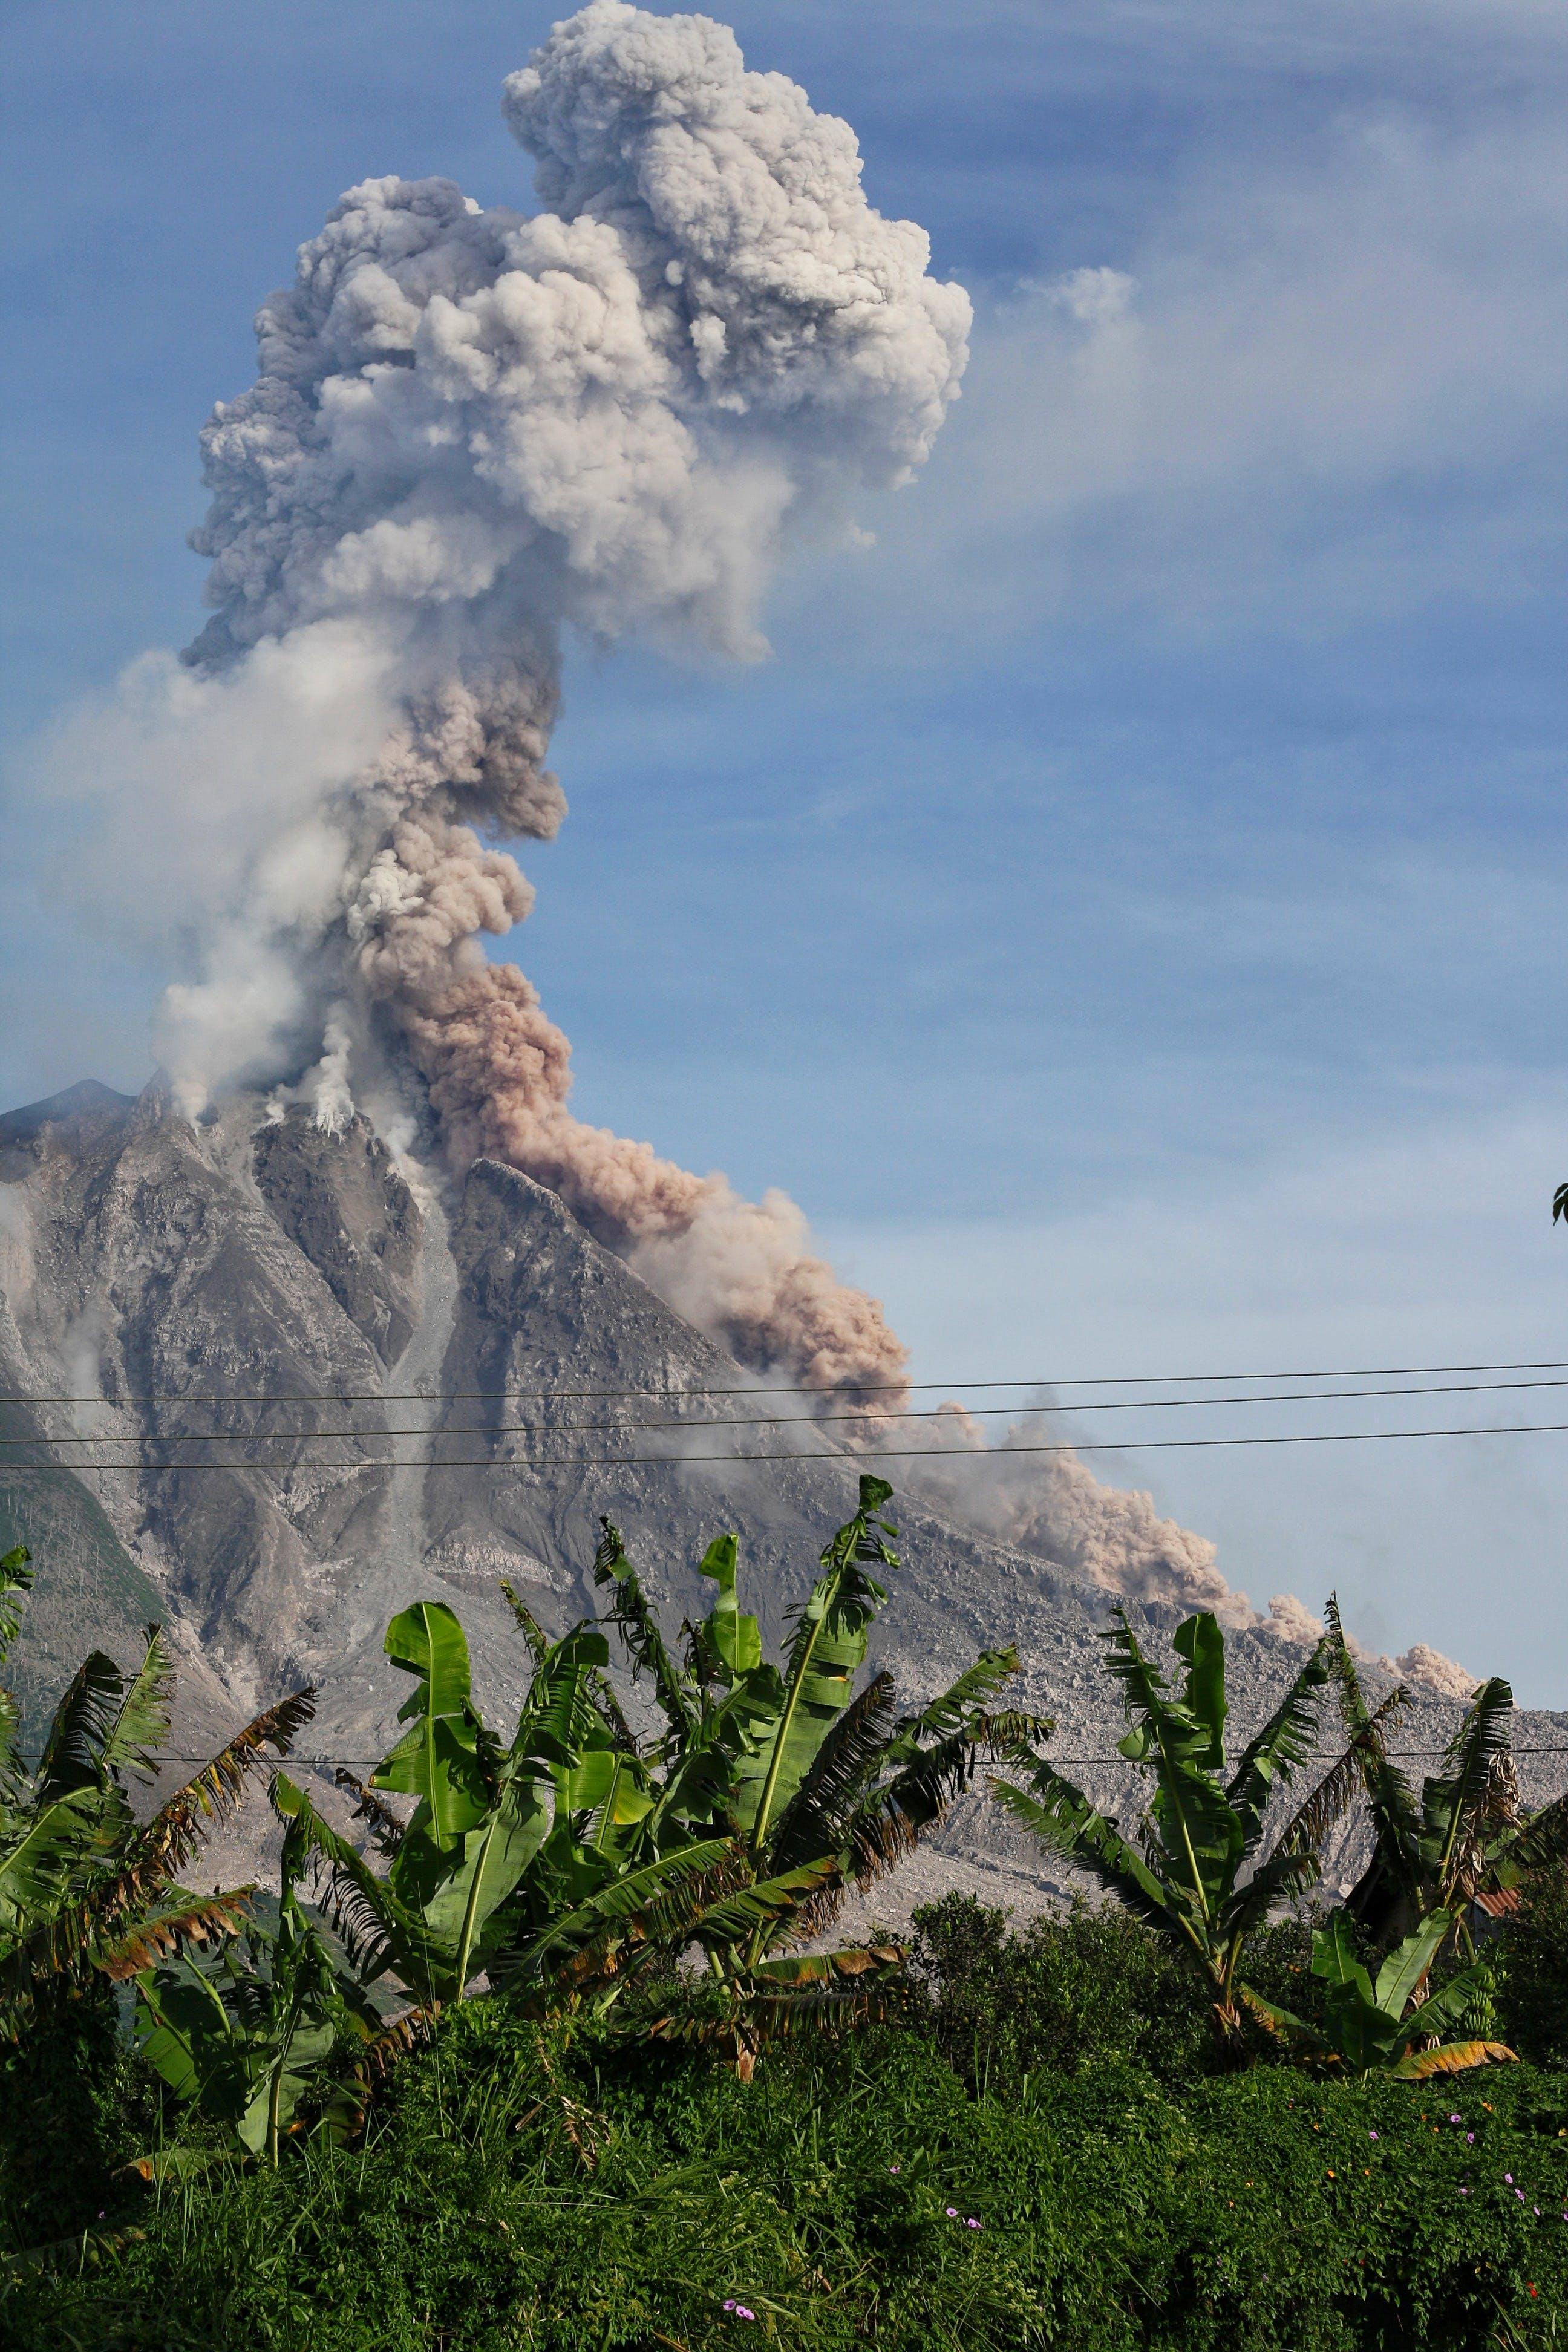 Erupting Volcano Under Blue Sunny Cloudy Sky